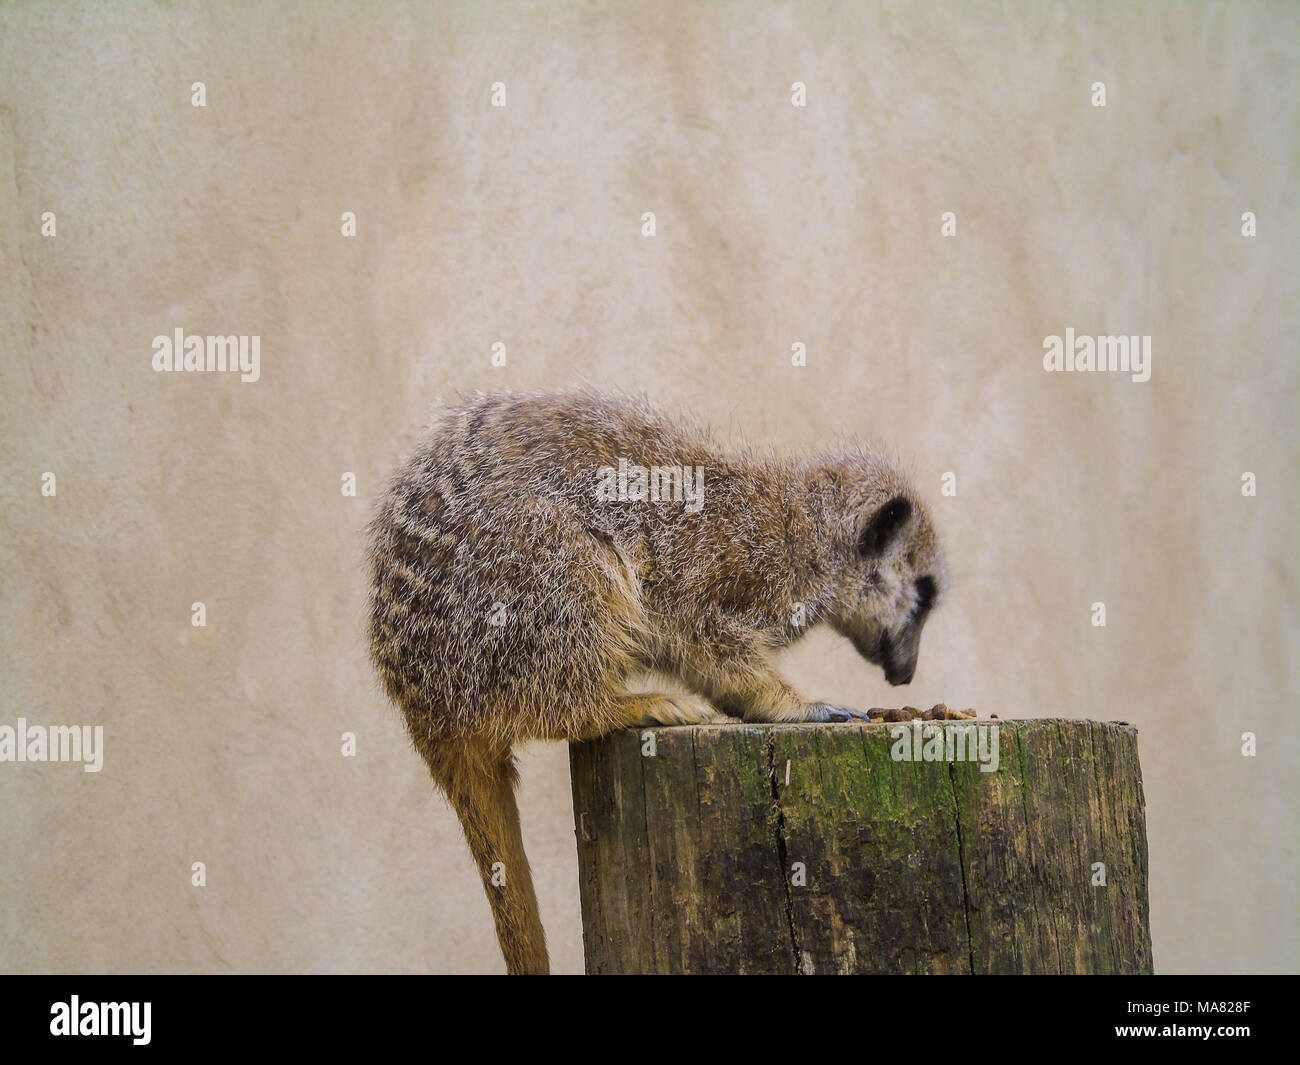 Meerkat Mania- Lots of meerkats sitting and wlaking around - Stock Image